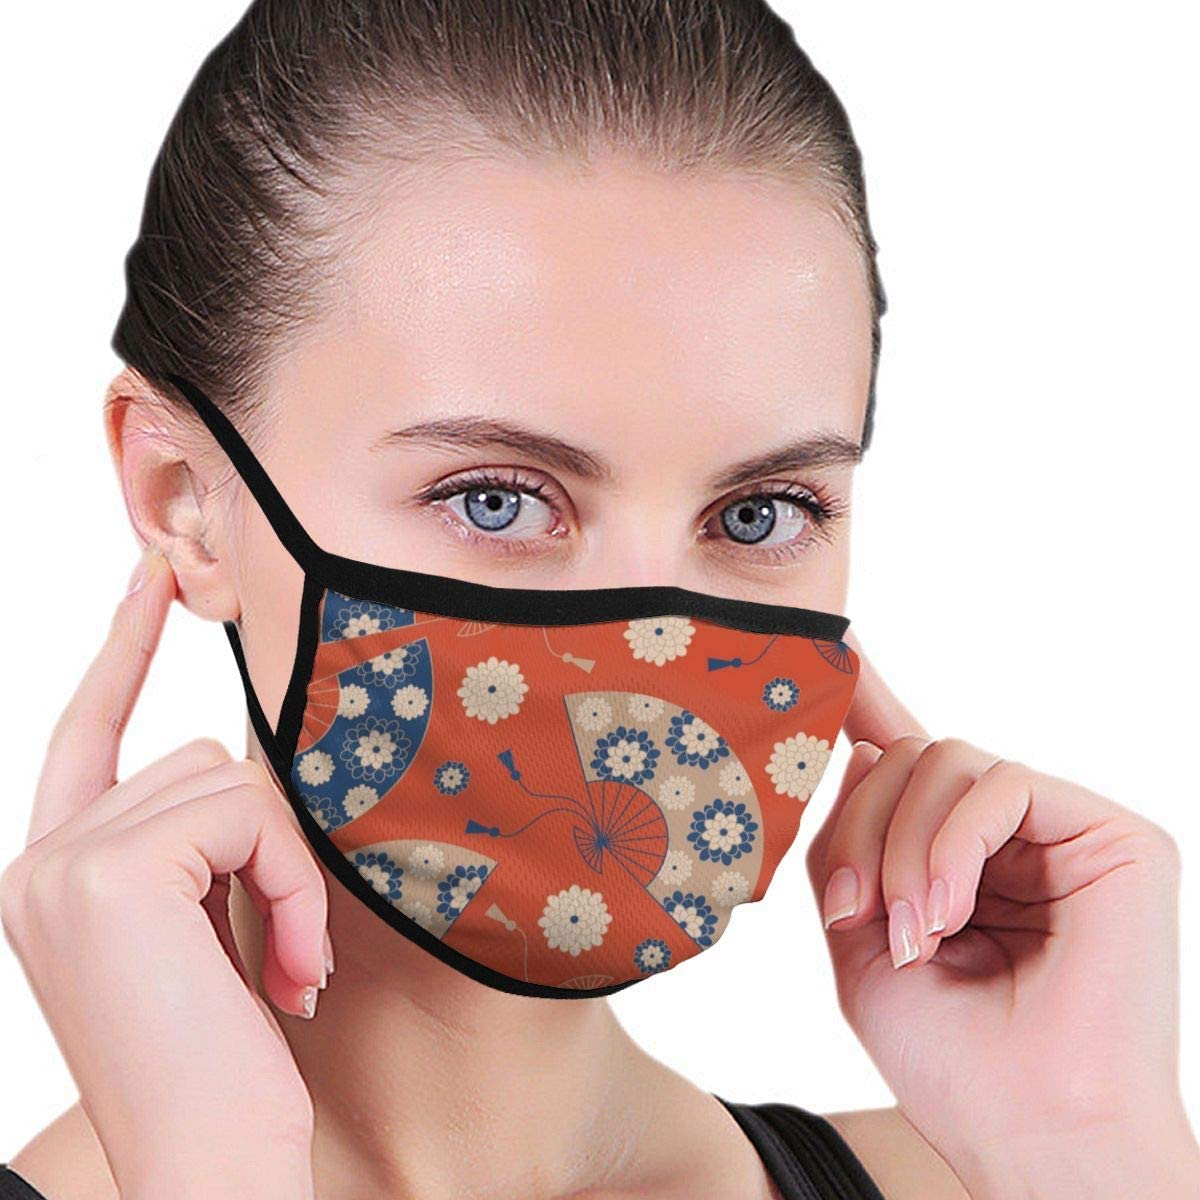 Leopard Skin 80s-90sMen's Women's Print Warm Washable Reusable Ear Warmer Neck Warmer Construction Mouth Wear